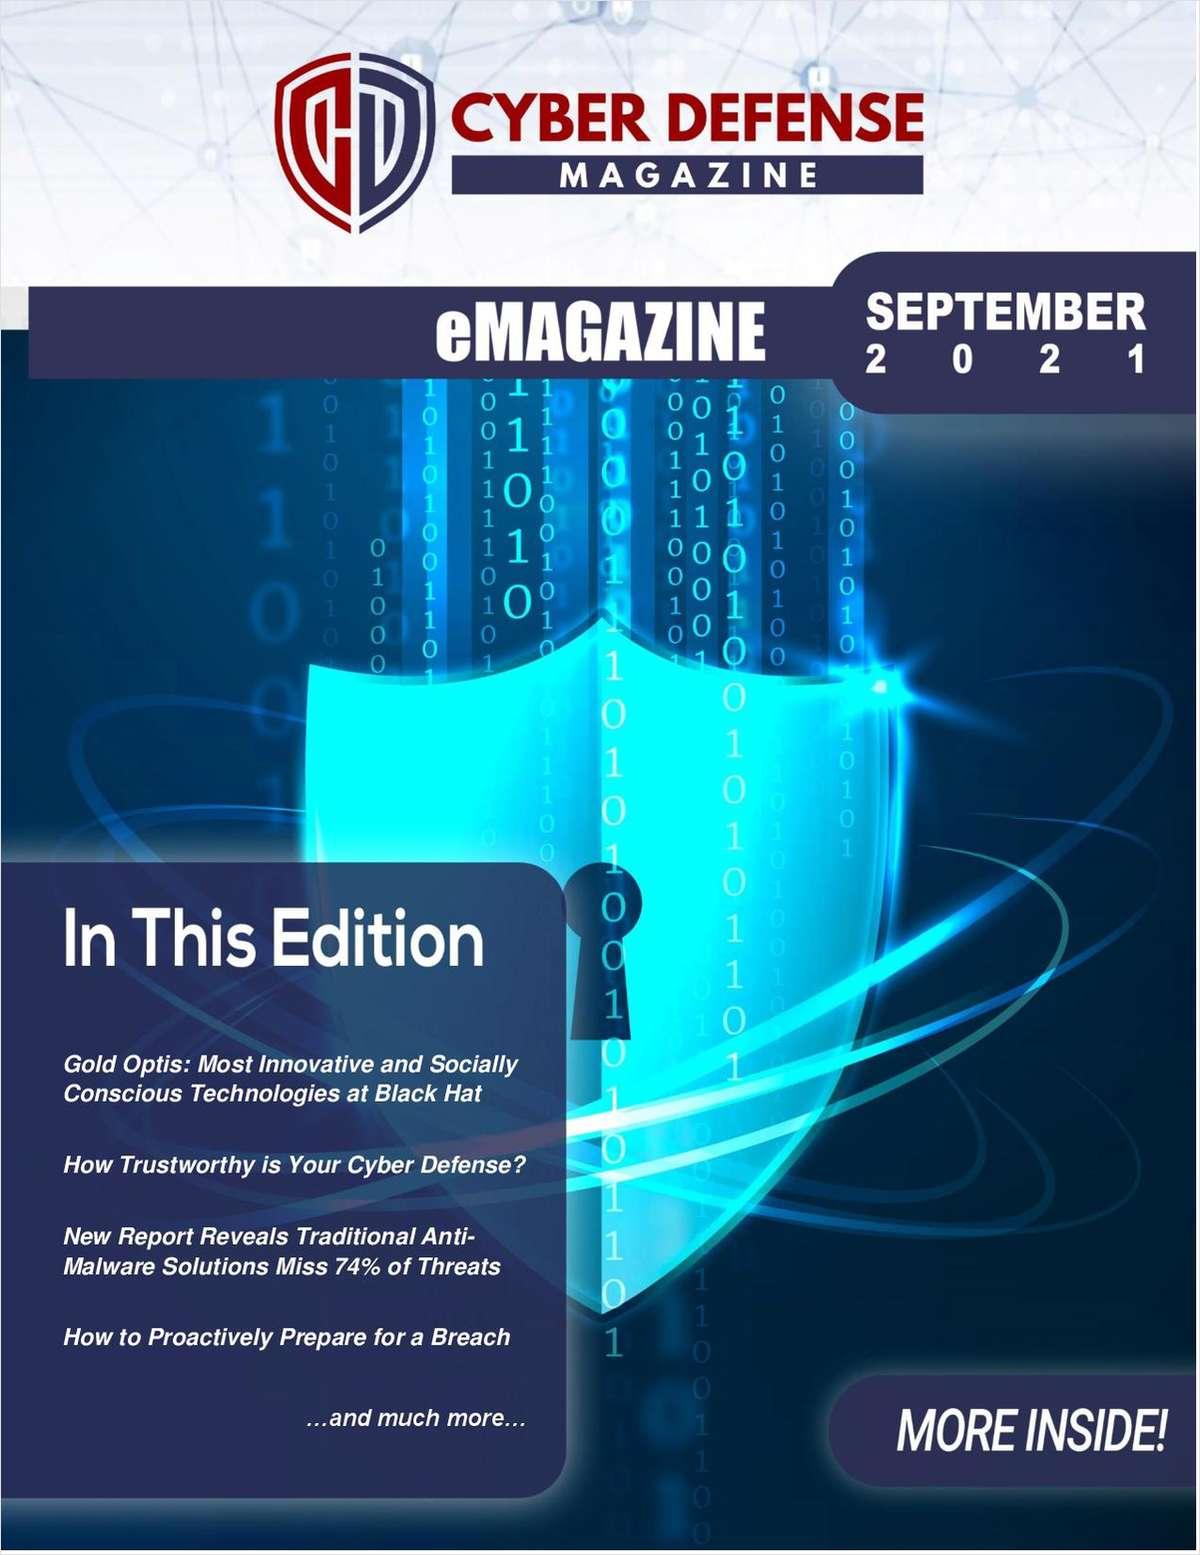 Cyber Defense Magazine September 2021 Edition